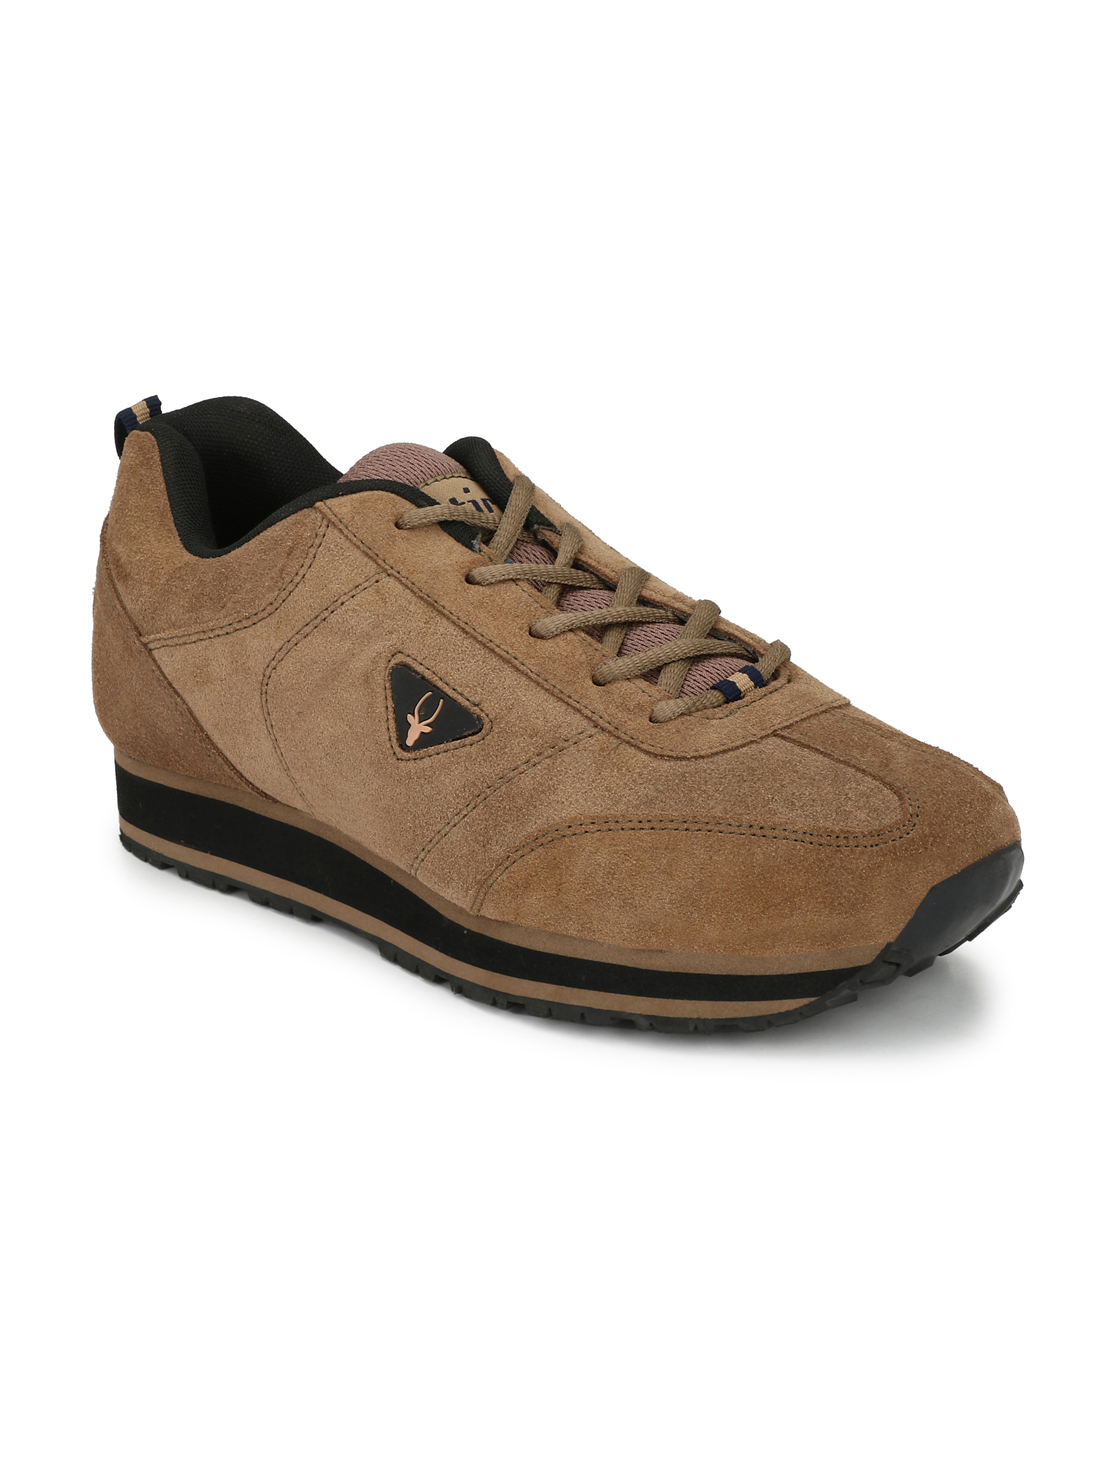 Hirolas   Hirolas Men's Multisport Leather Sneaker Shoes- Camel